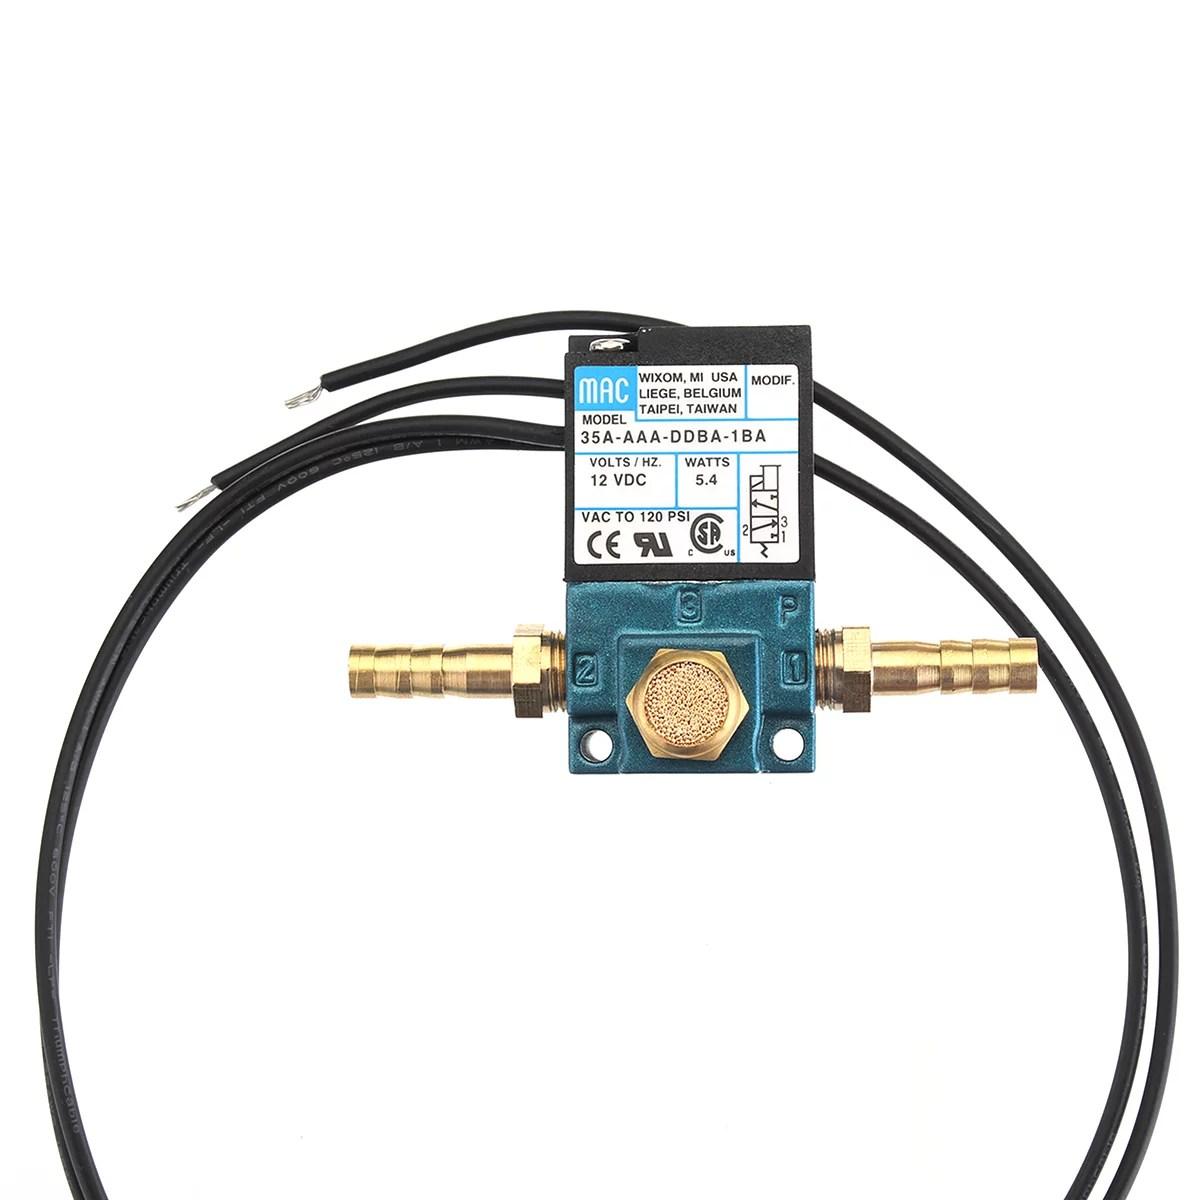 hight resolution of 3 port dc 12v 5 4 w electronic boost control solenoid valve for ecu pwm 35a aaa ddba 1ba walmart com